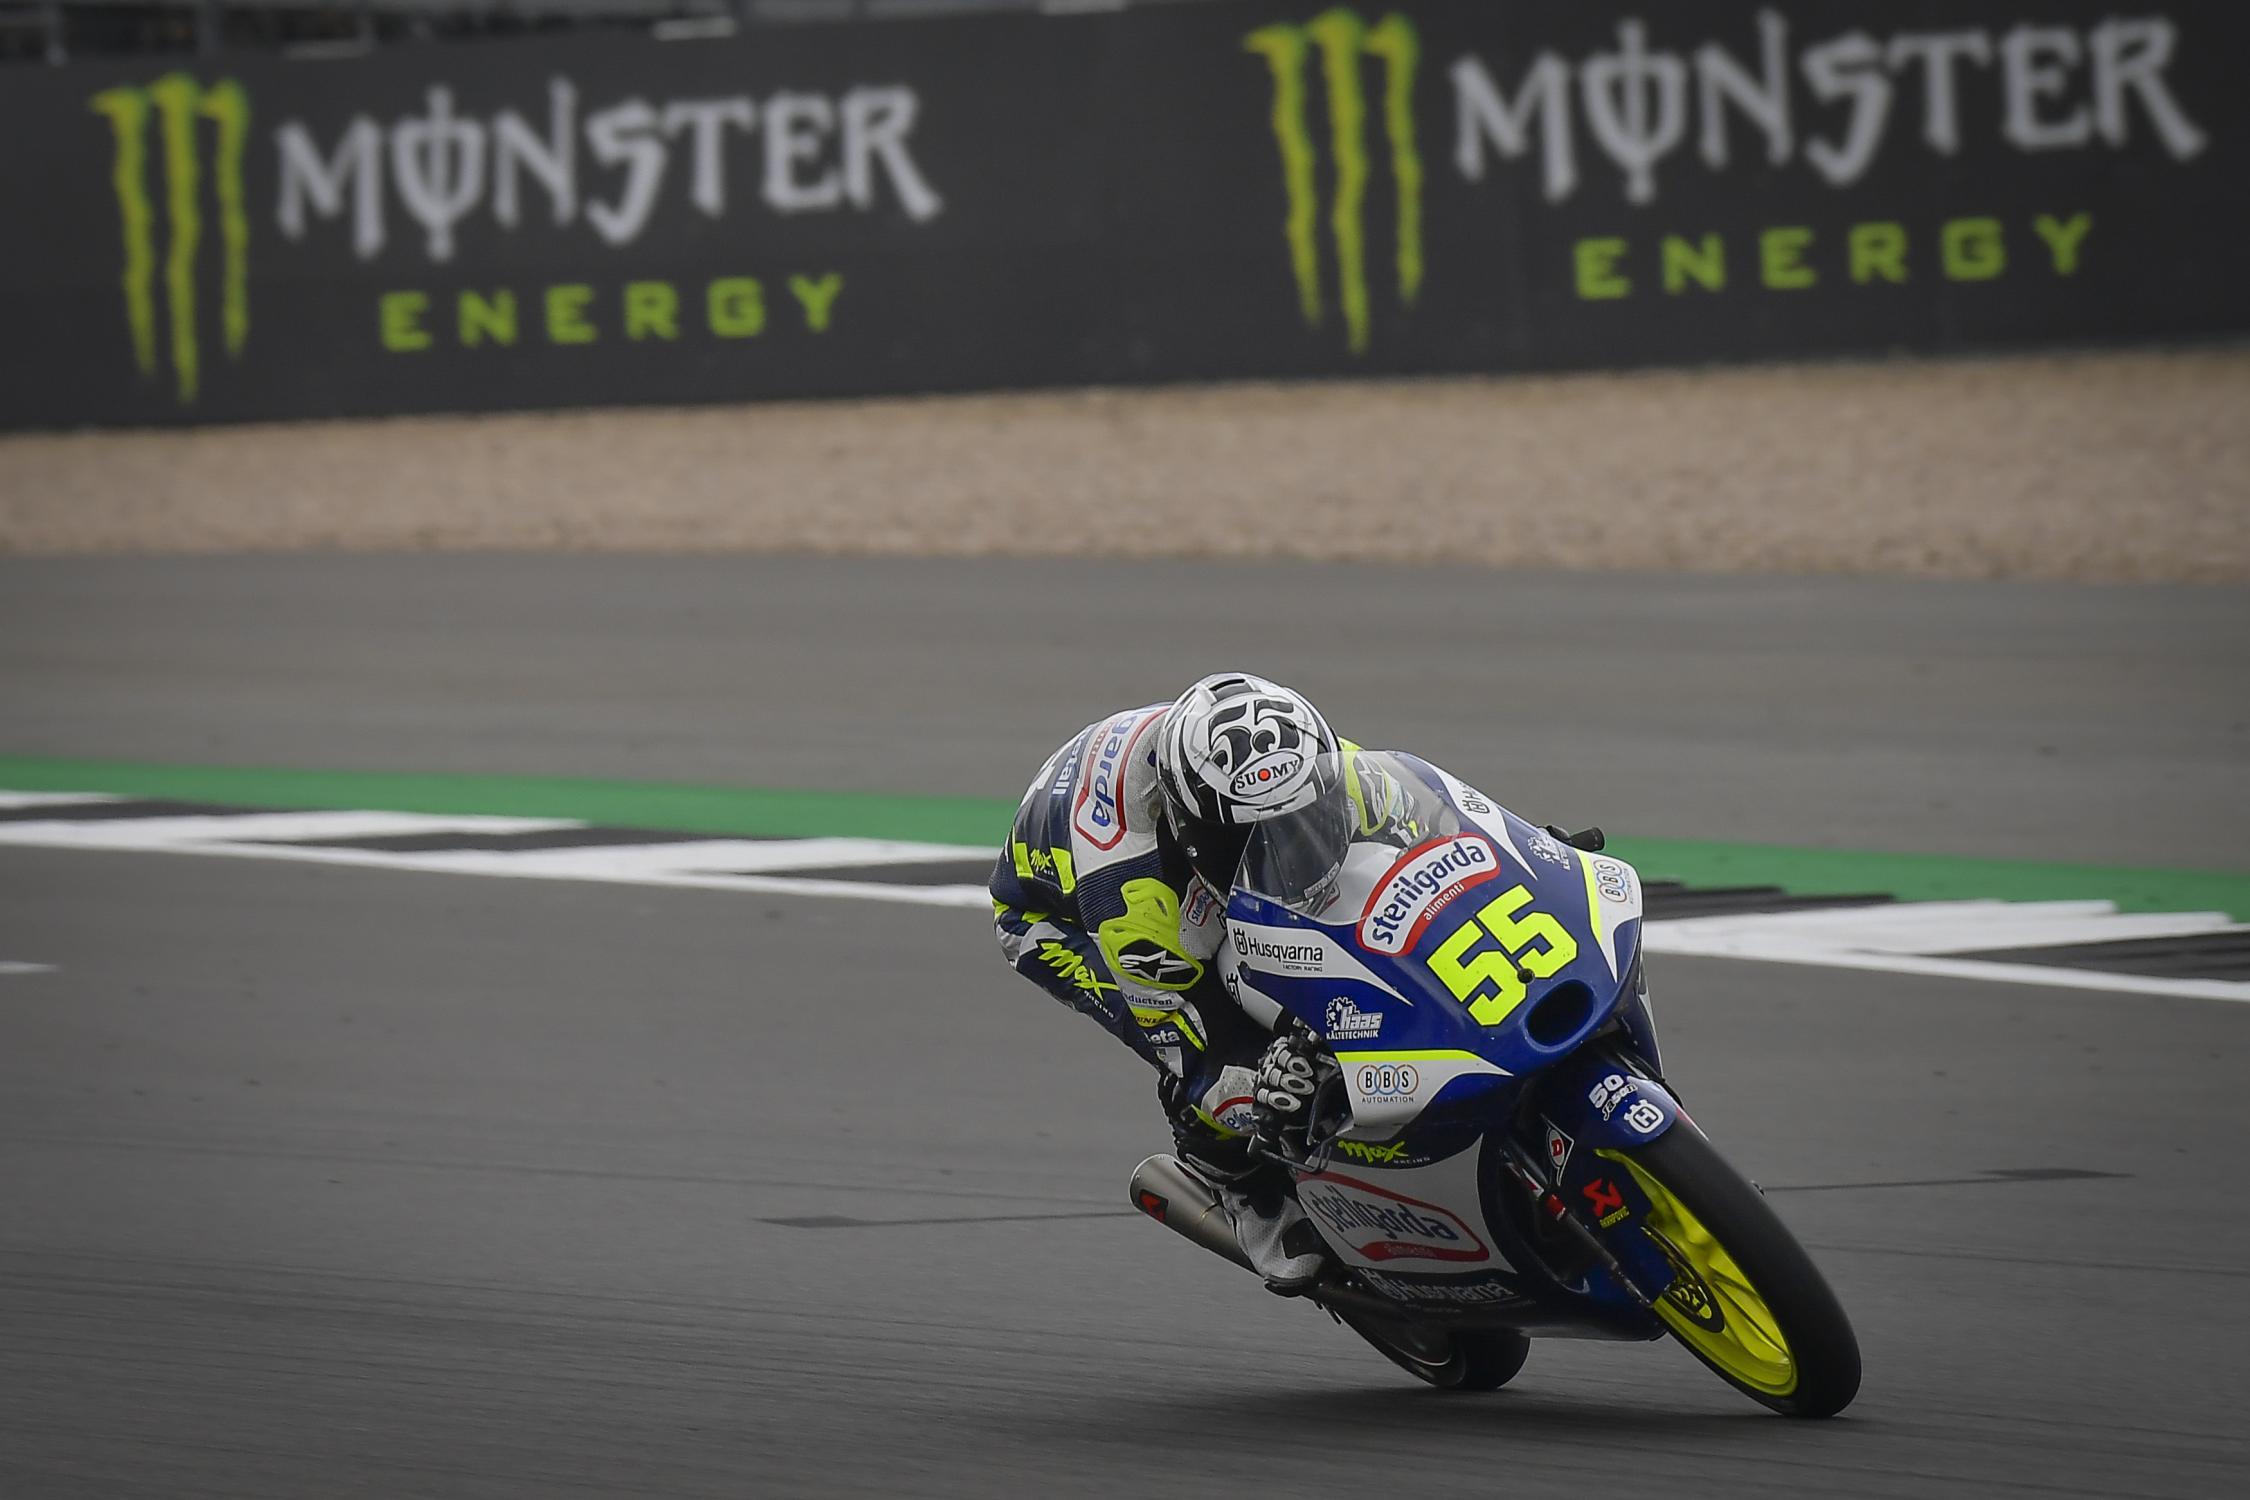 Romano Fenati, Max Racing Team, Monster Energy British Grand Prix